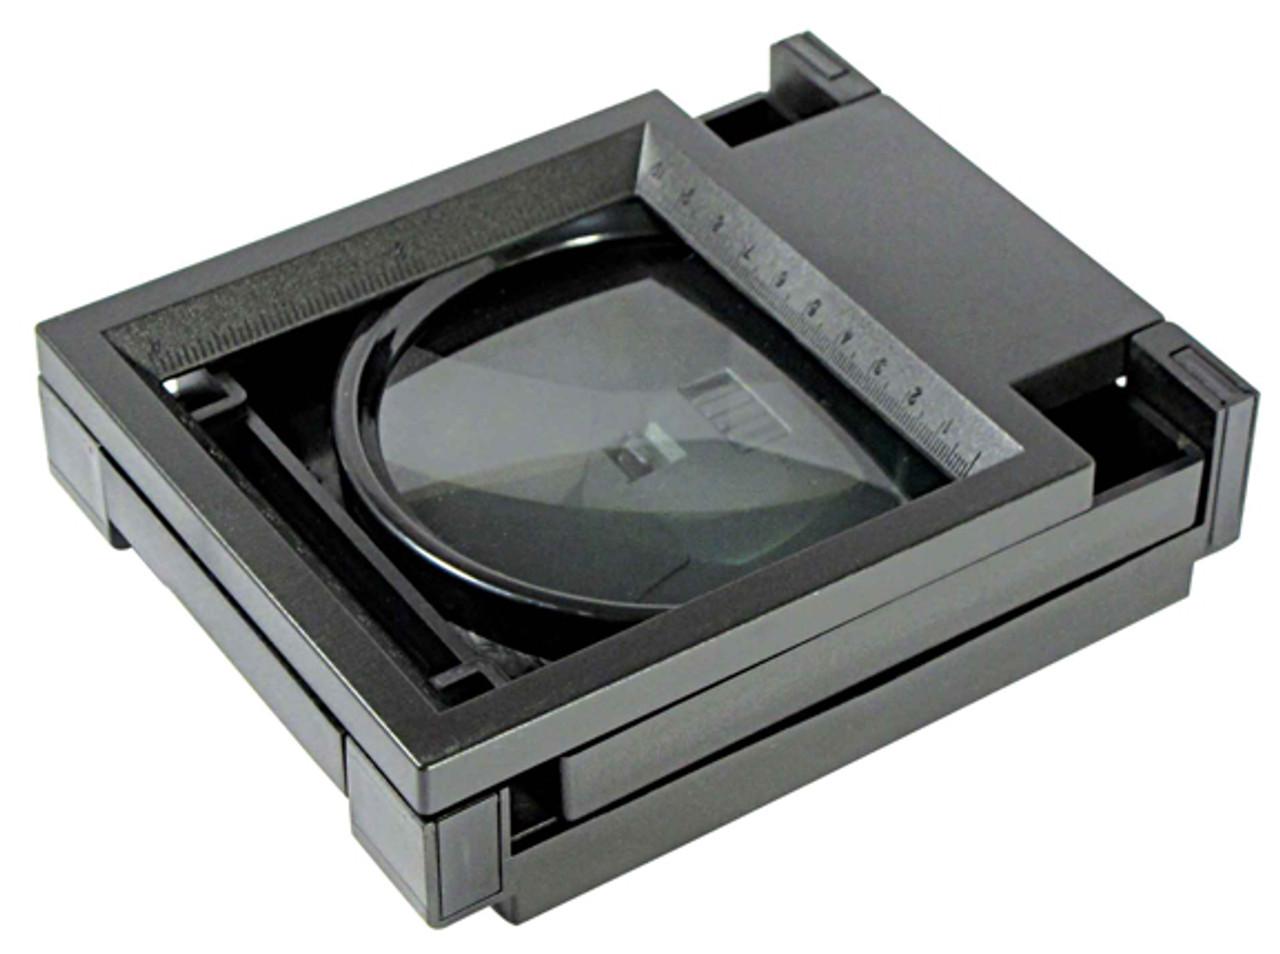 MT-MA1103L compact storage